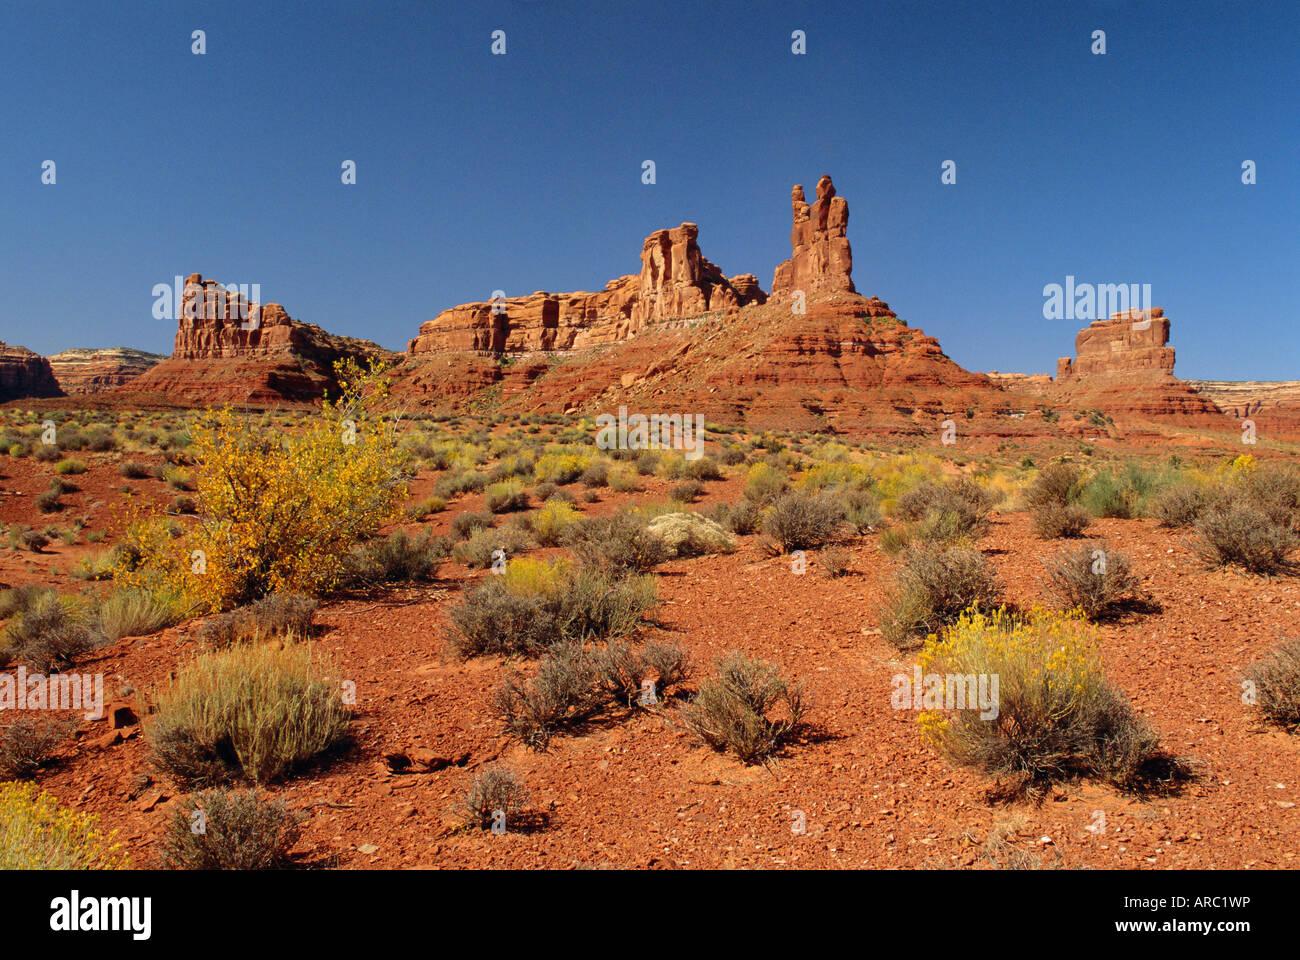 Sandstone monoliths, Valley of the Gods, Utah, USA - Stock Image